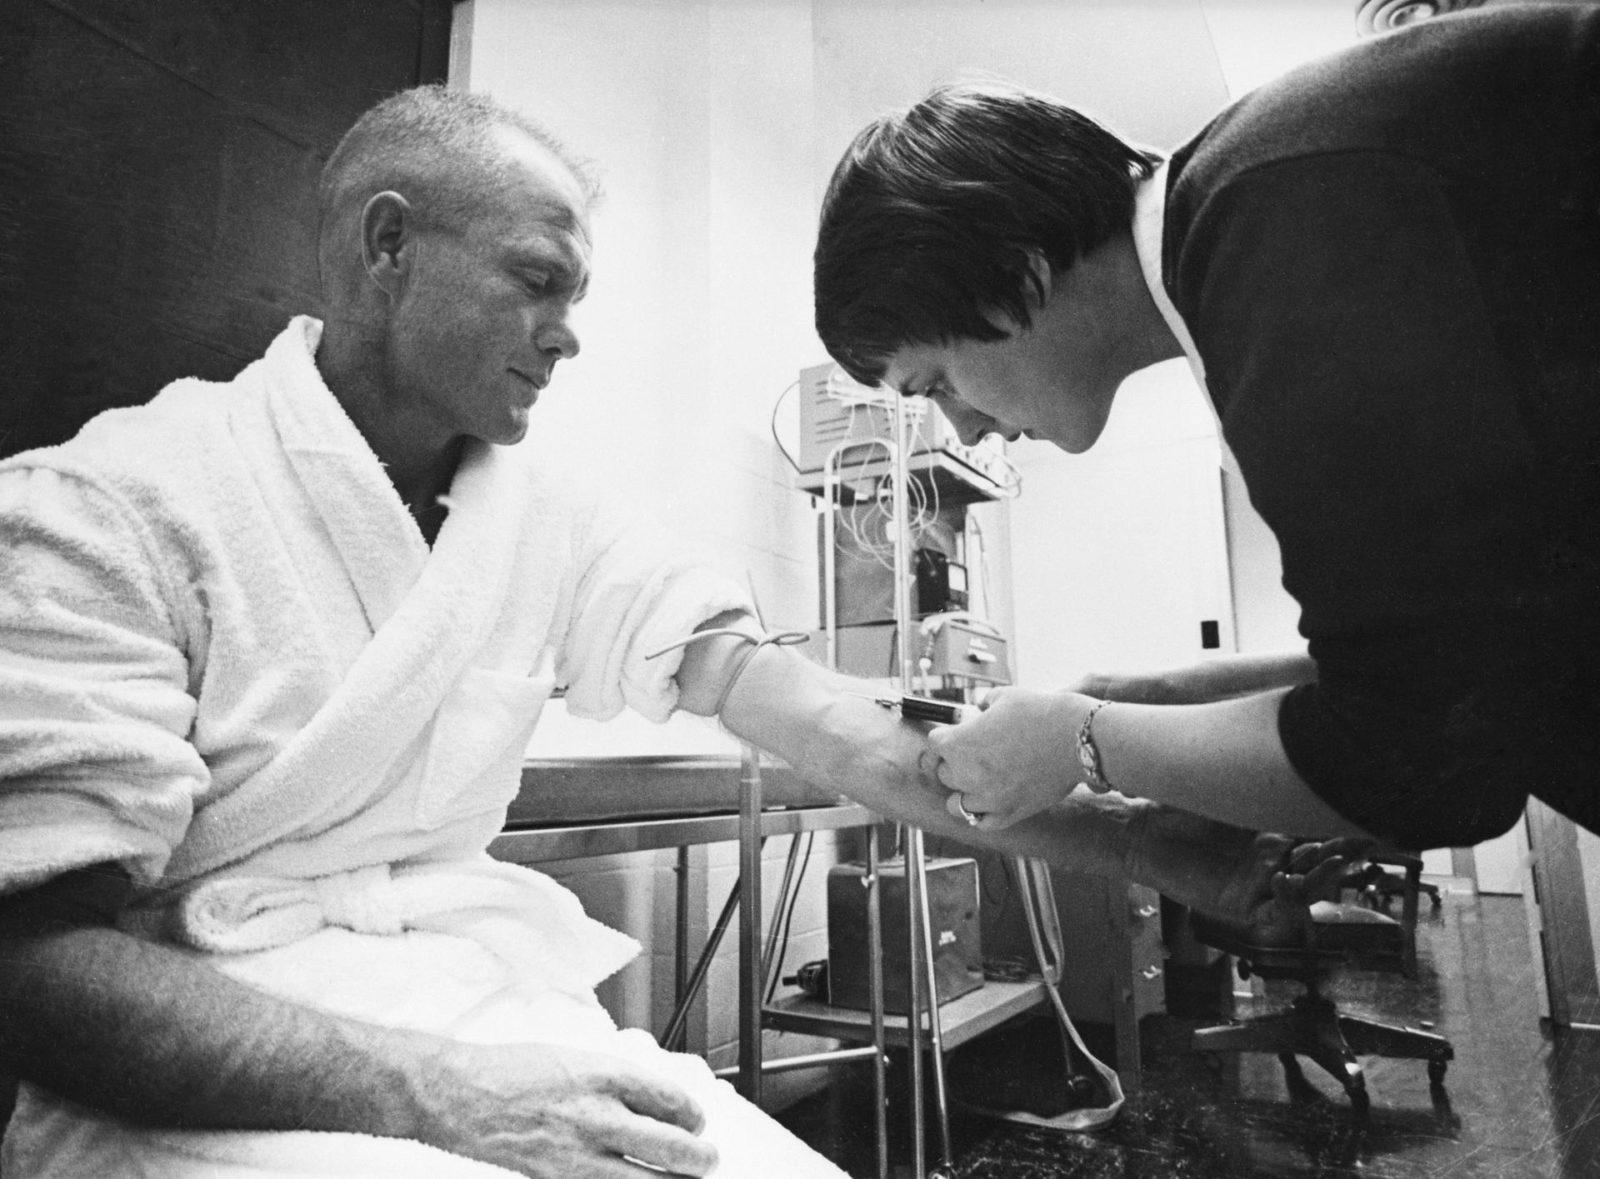 Astronaut John Glenn - Blood Draw - Training - Cape